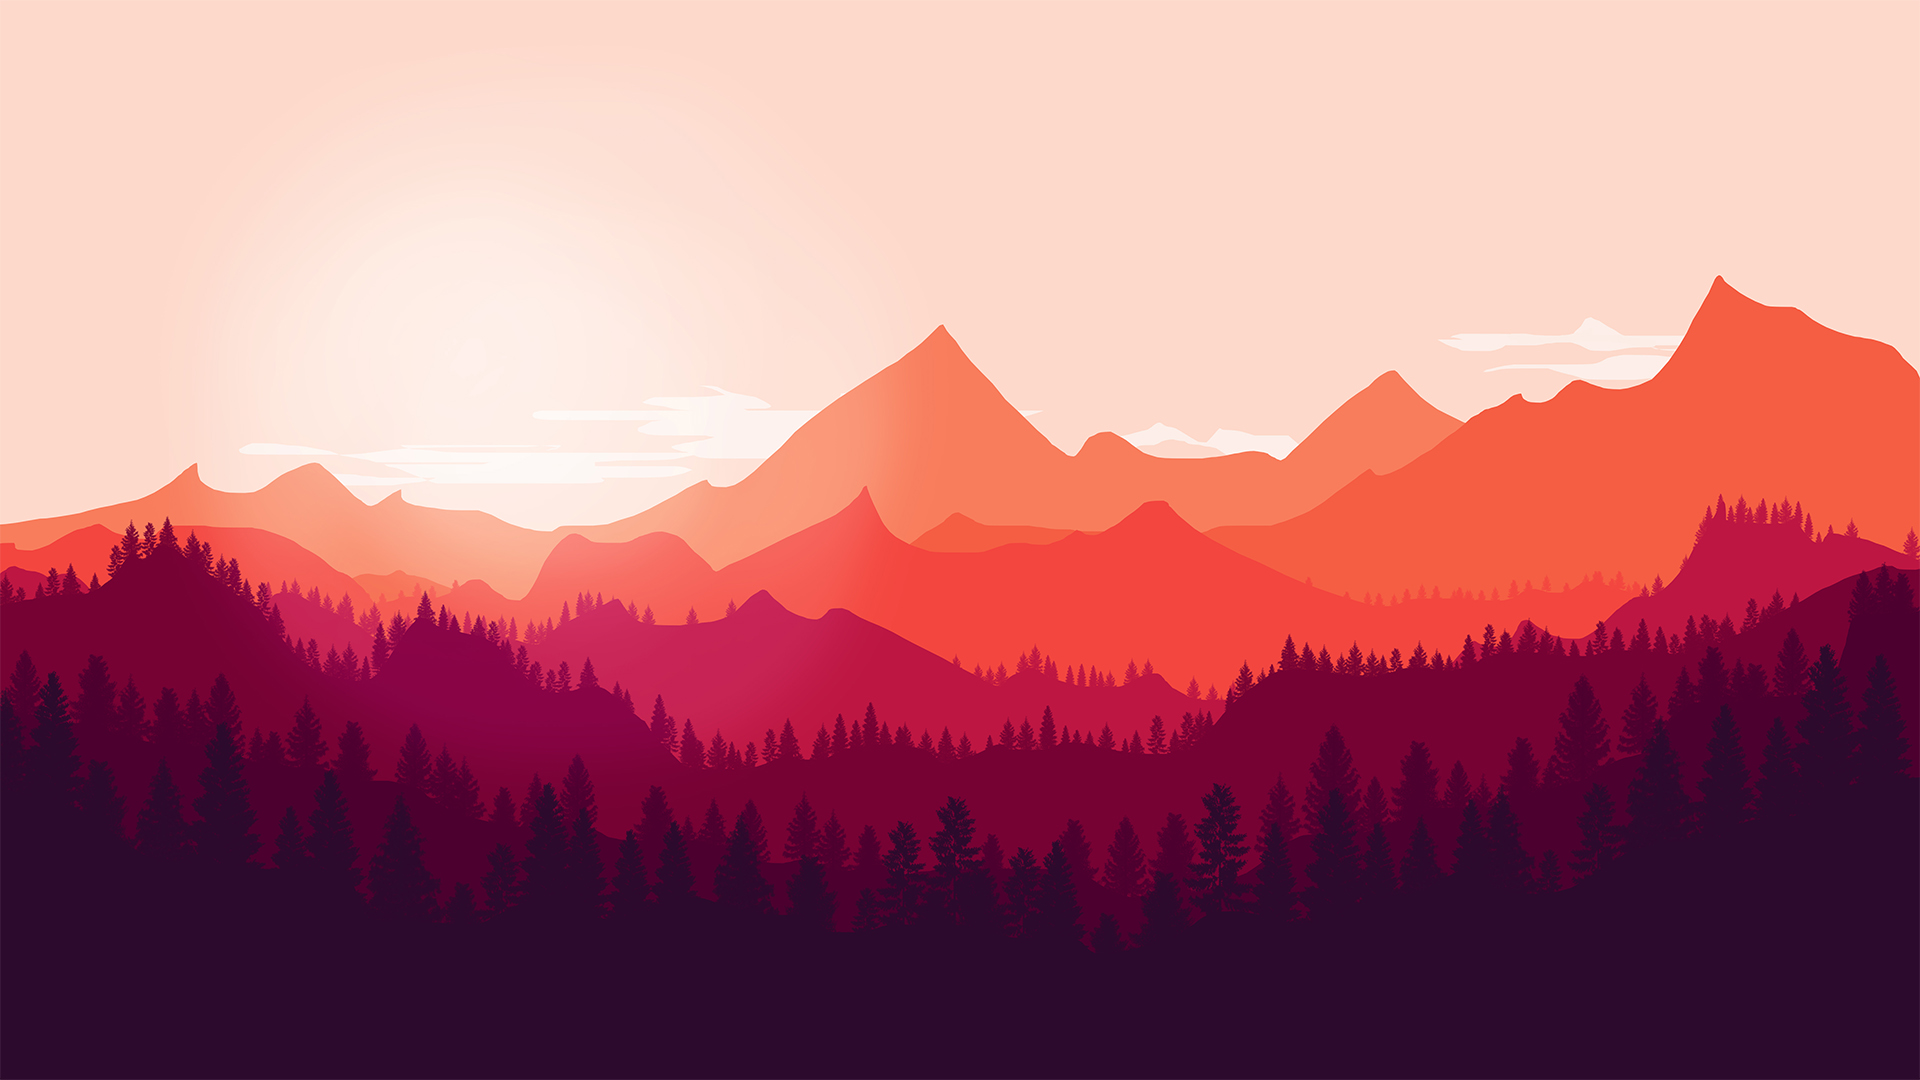 Flat mountains landscape by ggiuliafilippini on deviantart for Minimal art landscape